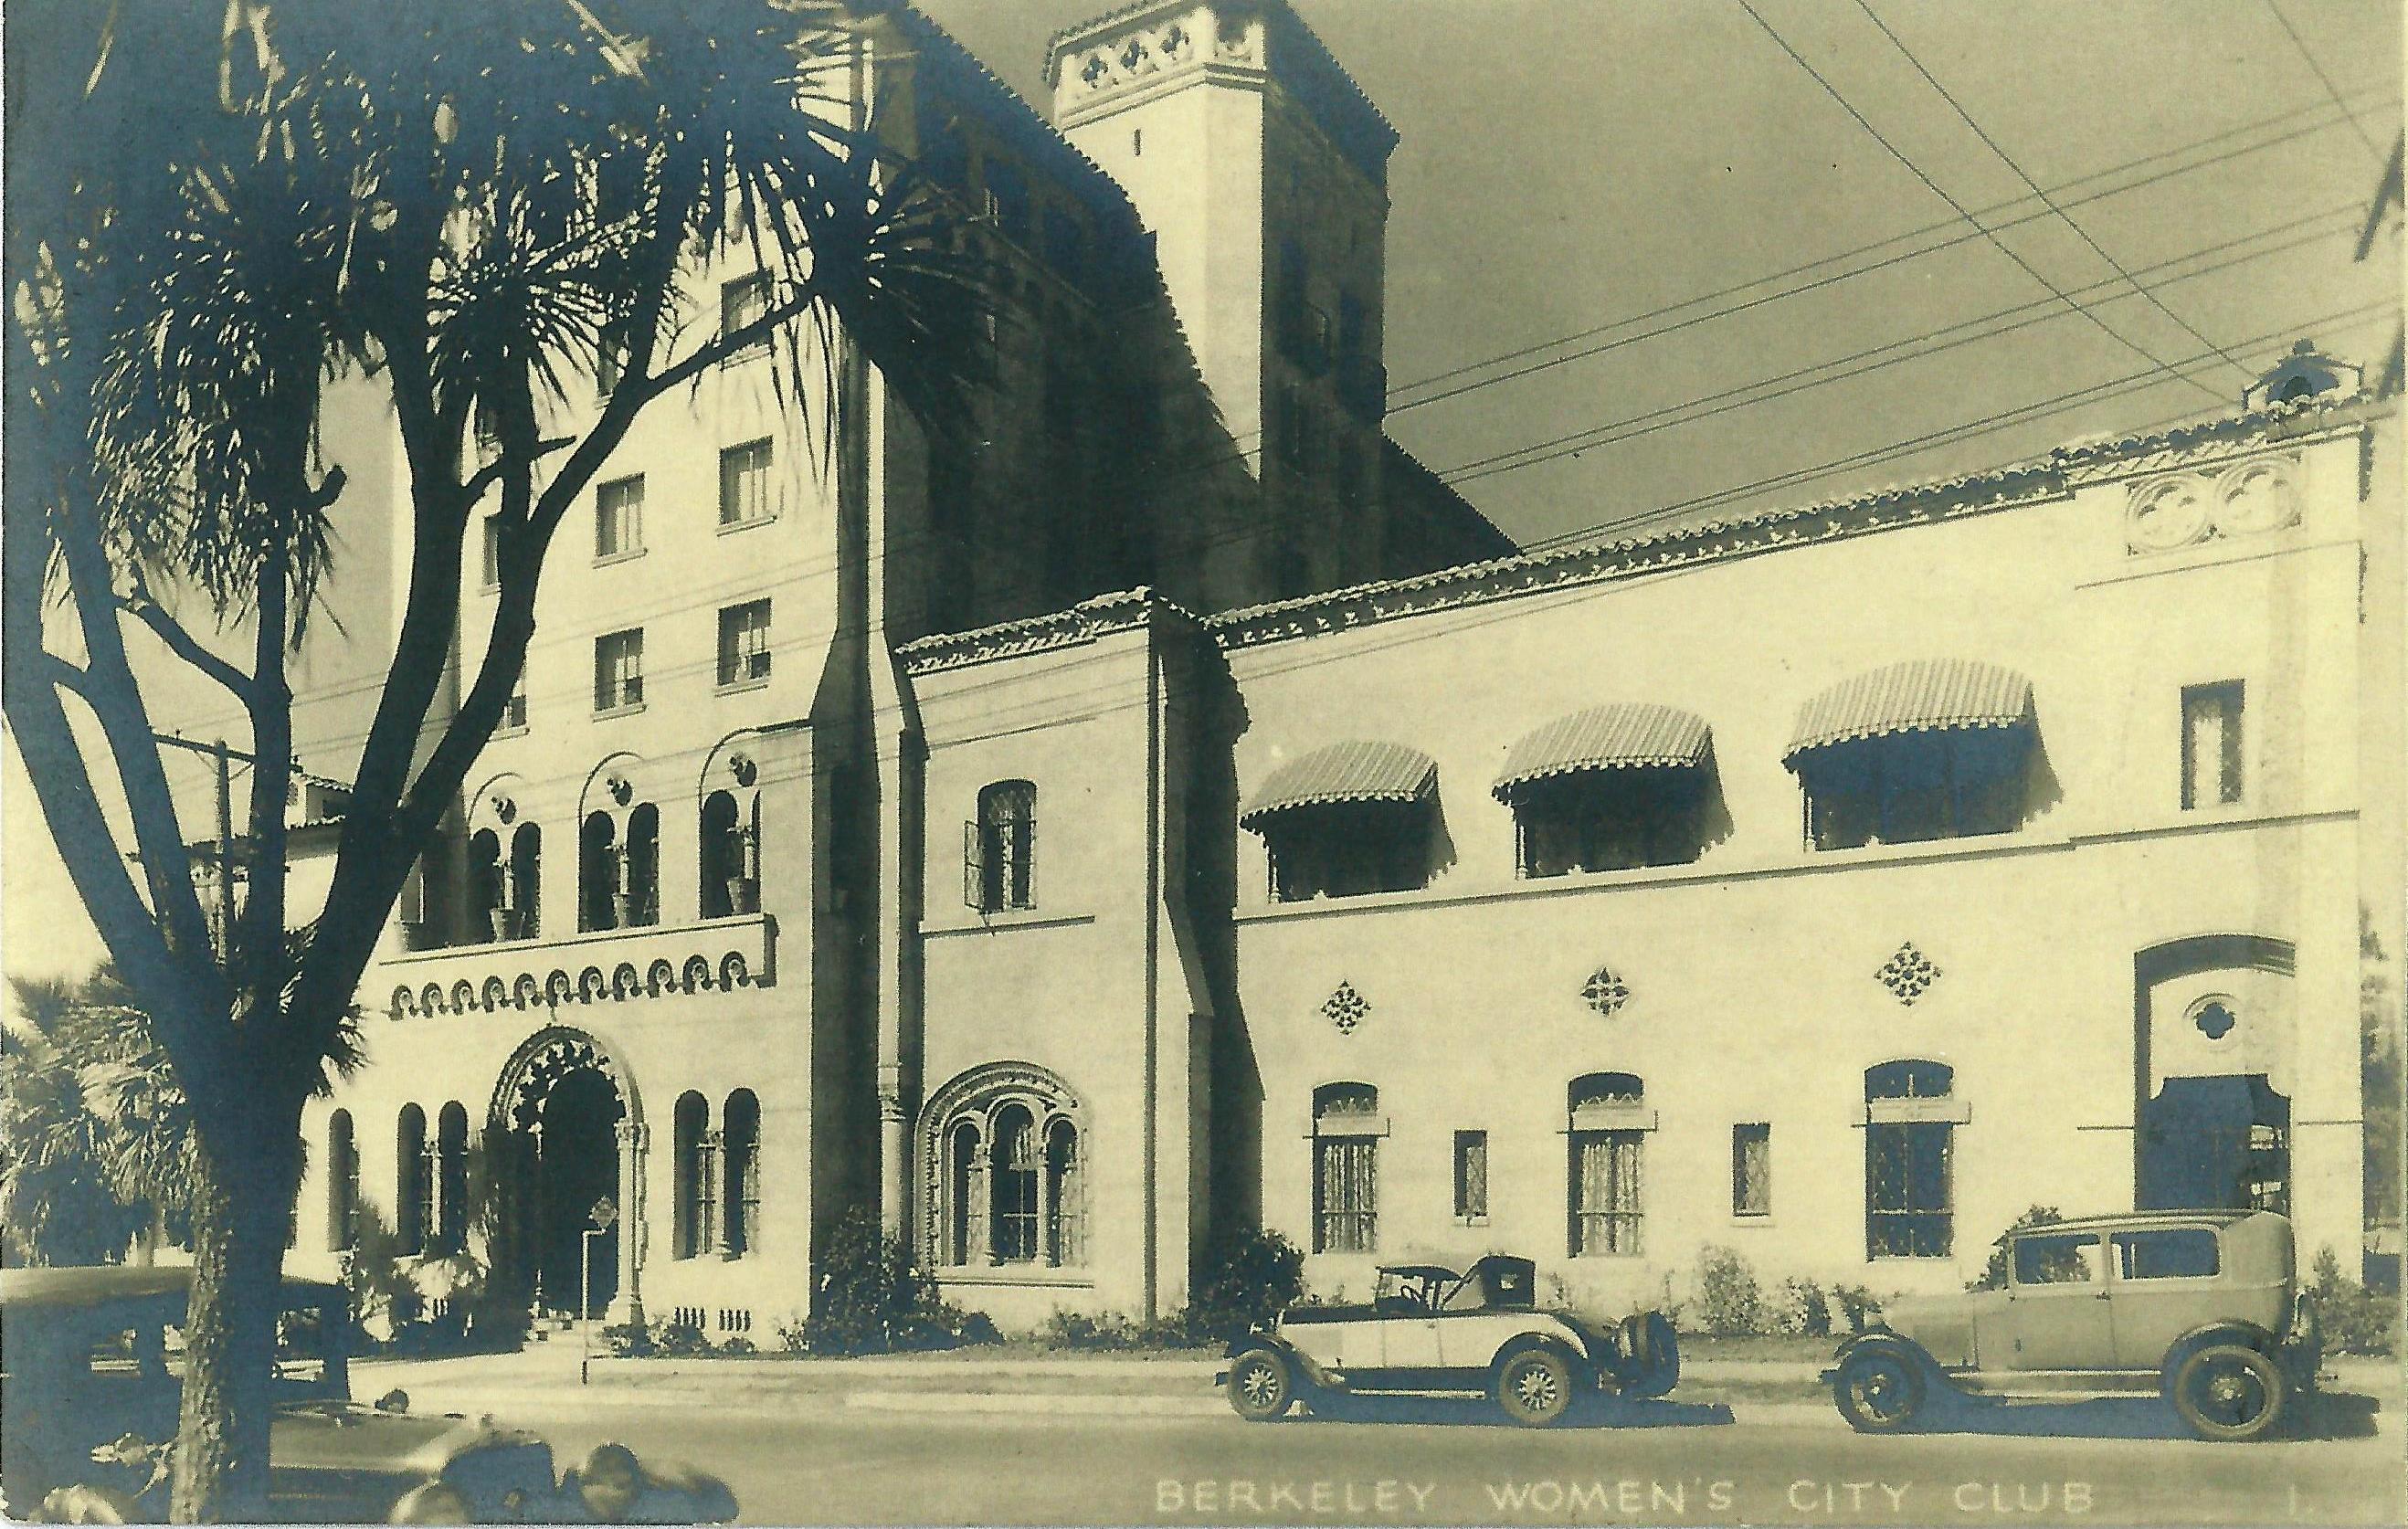 Berkeley Women's City Club postcard (ca. 1931)